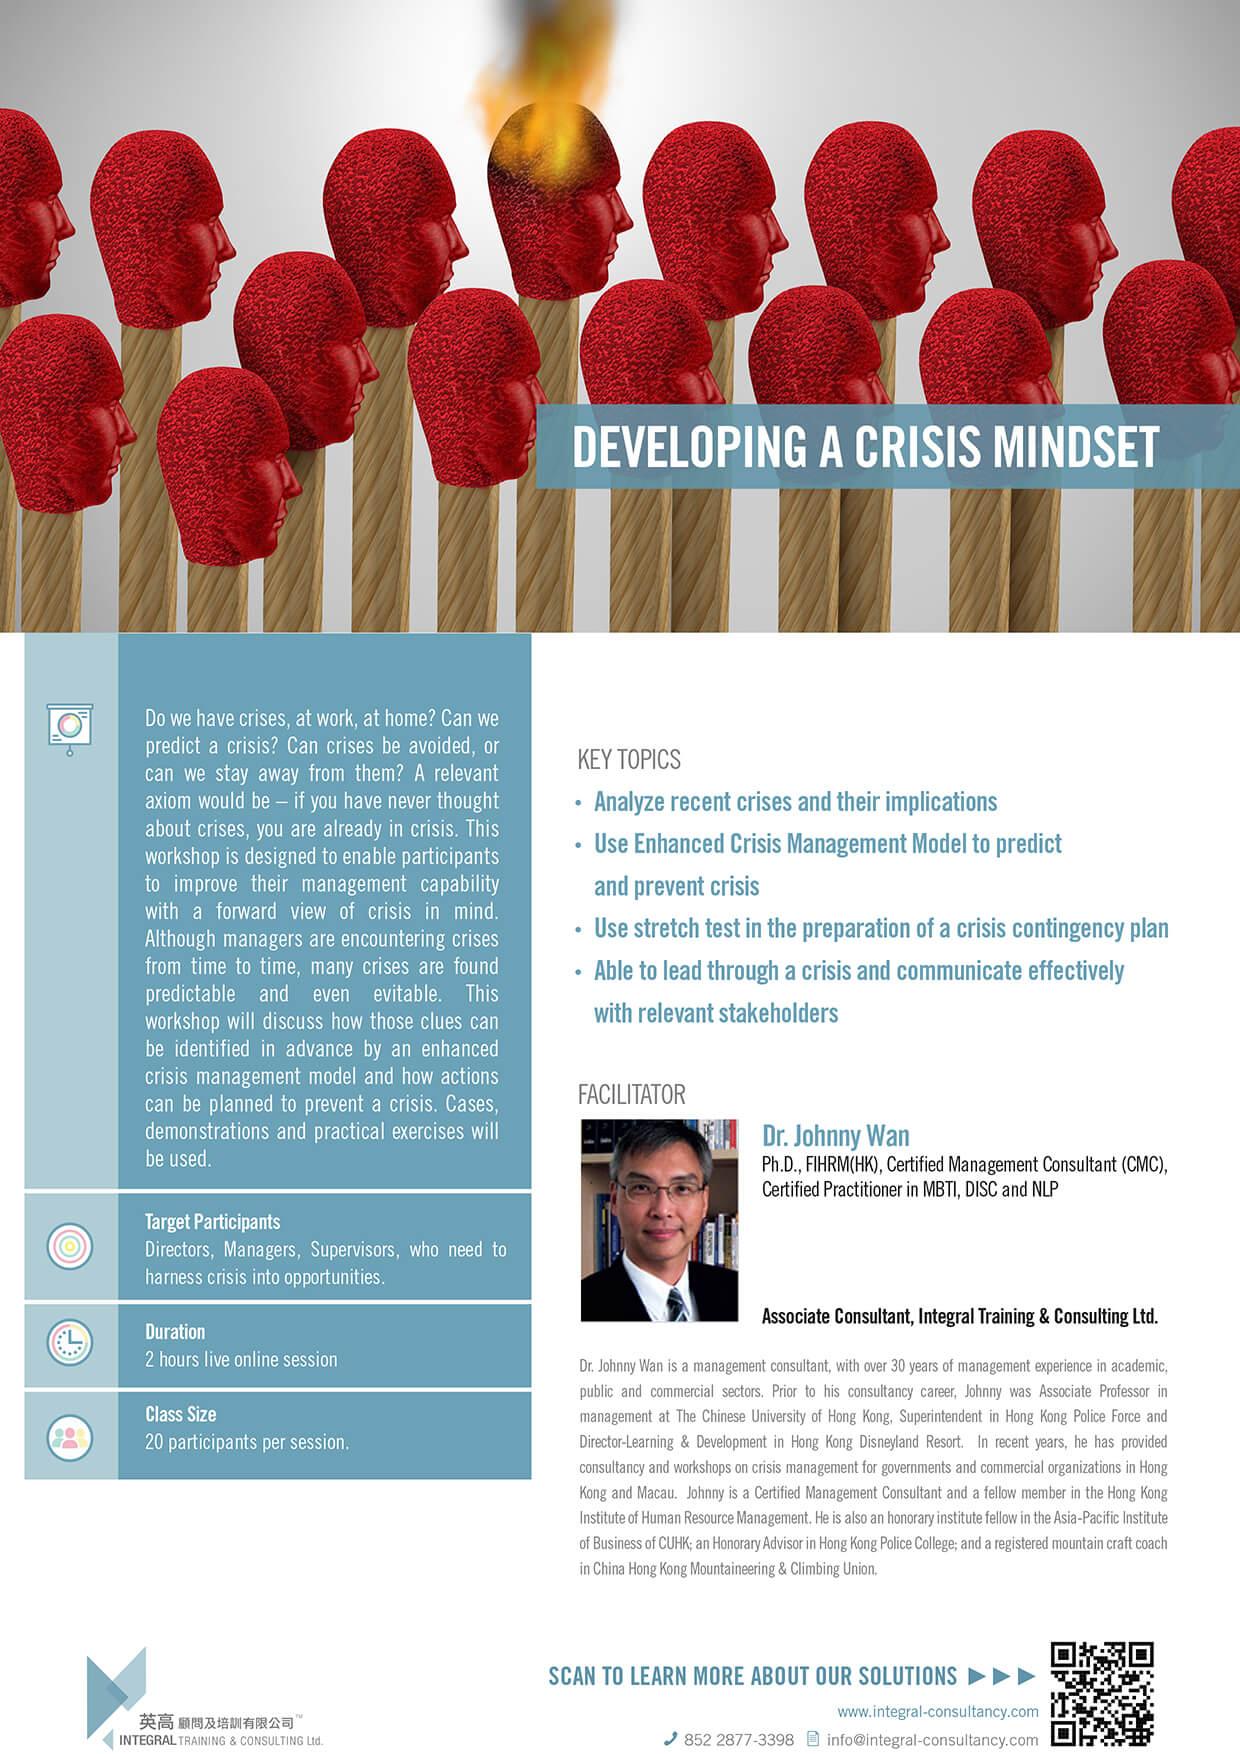 Developing a Crisis Mindset